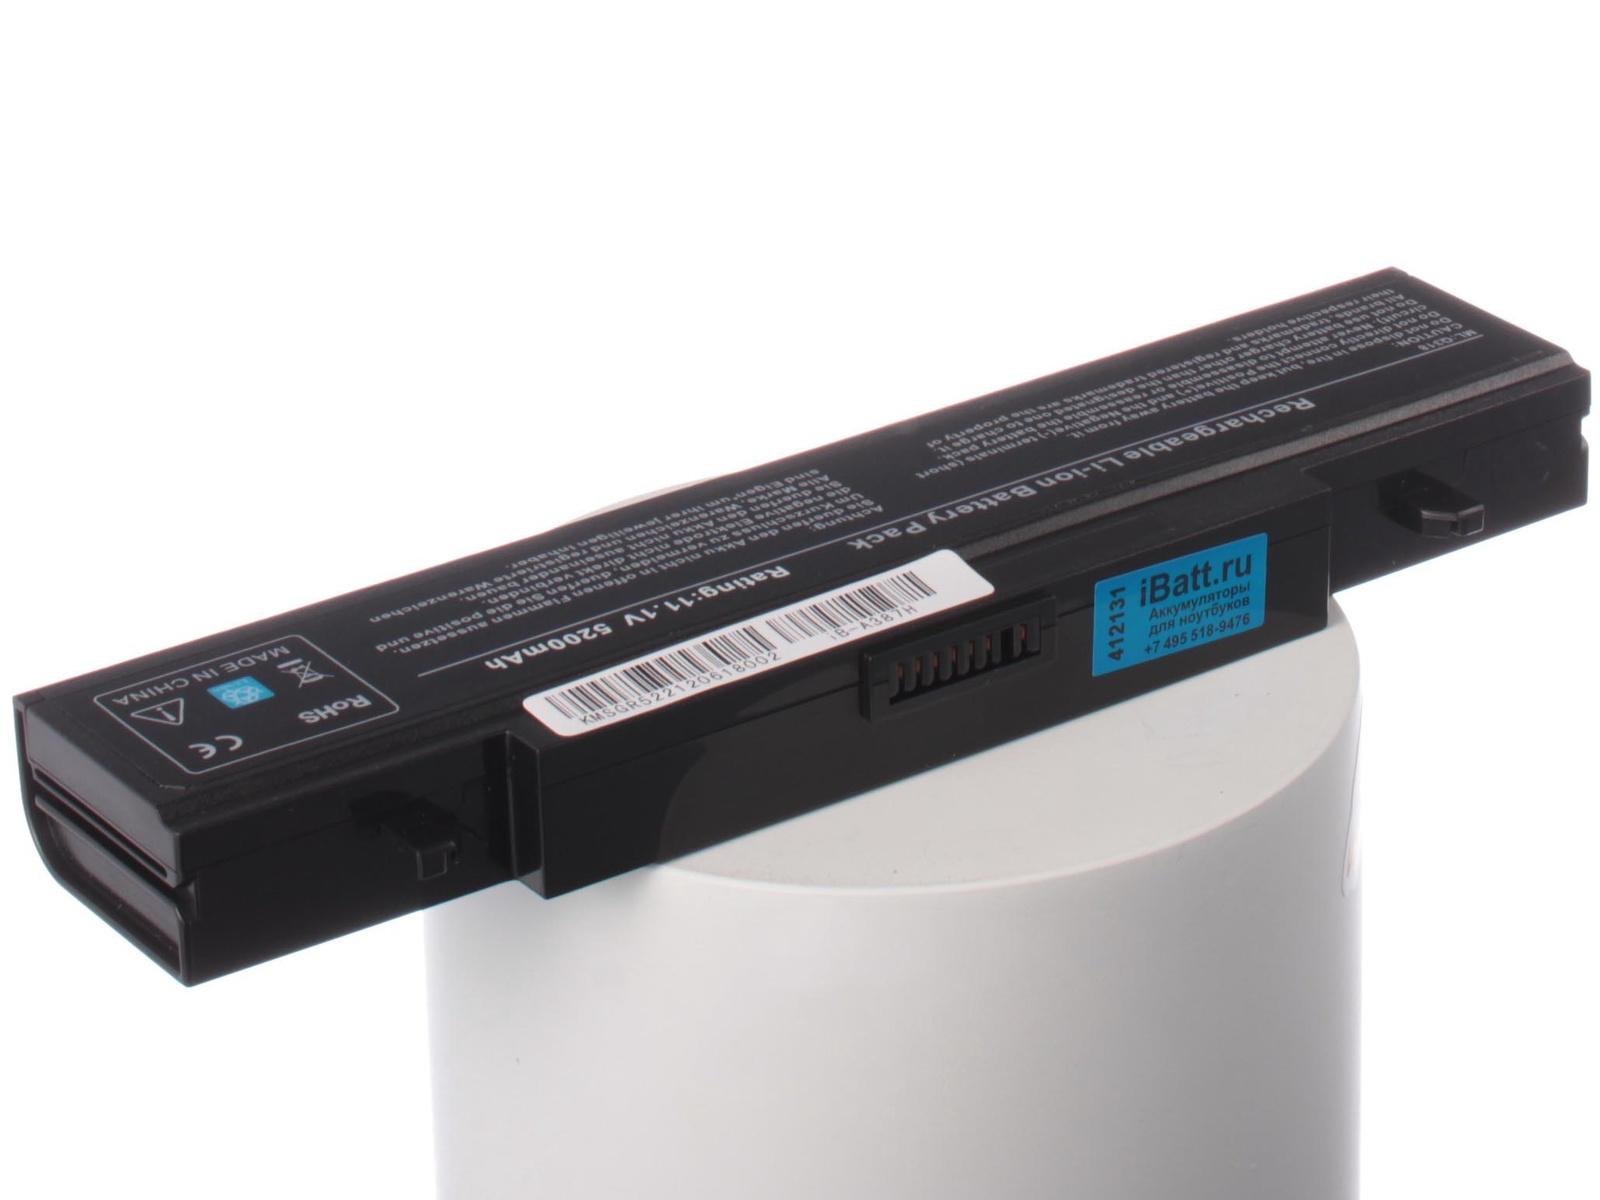 Аккумулятор для ноутбука iBatt для Samsung 300E5V-A02, 300V5A-S01, 305V5A-T07, 350E7C-A03, 350V5C-S07, 350V5C-S0F, 355V5X-S01, R425-JS01, R425-JS04, R540-JS02, R540-JT06, RV408-A01, RV511-S0A, 270E5E-K02, 300E5A-S08, 300E7A-S06 аккумулятор для ноутбука anybatt для samsung rv711 a01 300e5x u02 300v5a s0e 305v5a t09 310e5c u05 350e7c a04 r430 ja01 r780 js02 rf712 s01 300e5c a0e 300e5z s01 np270e5e k02 r469 js01 r525 jt05 r540 js01 r580 js04